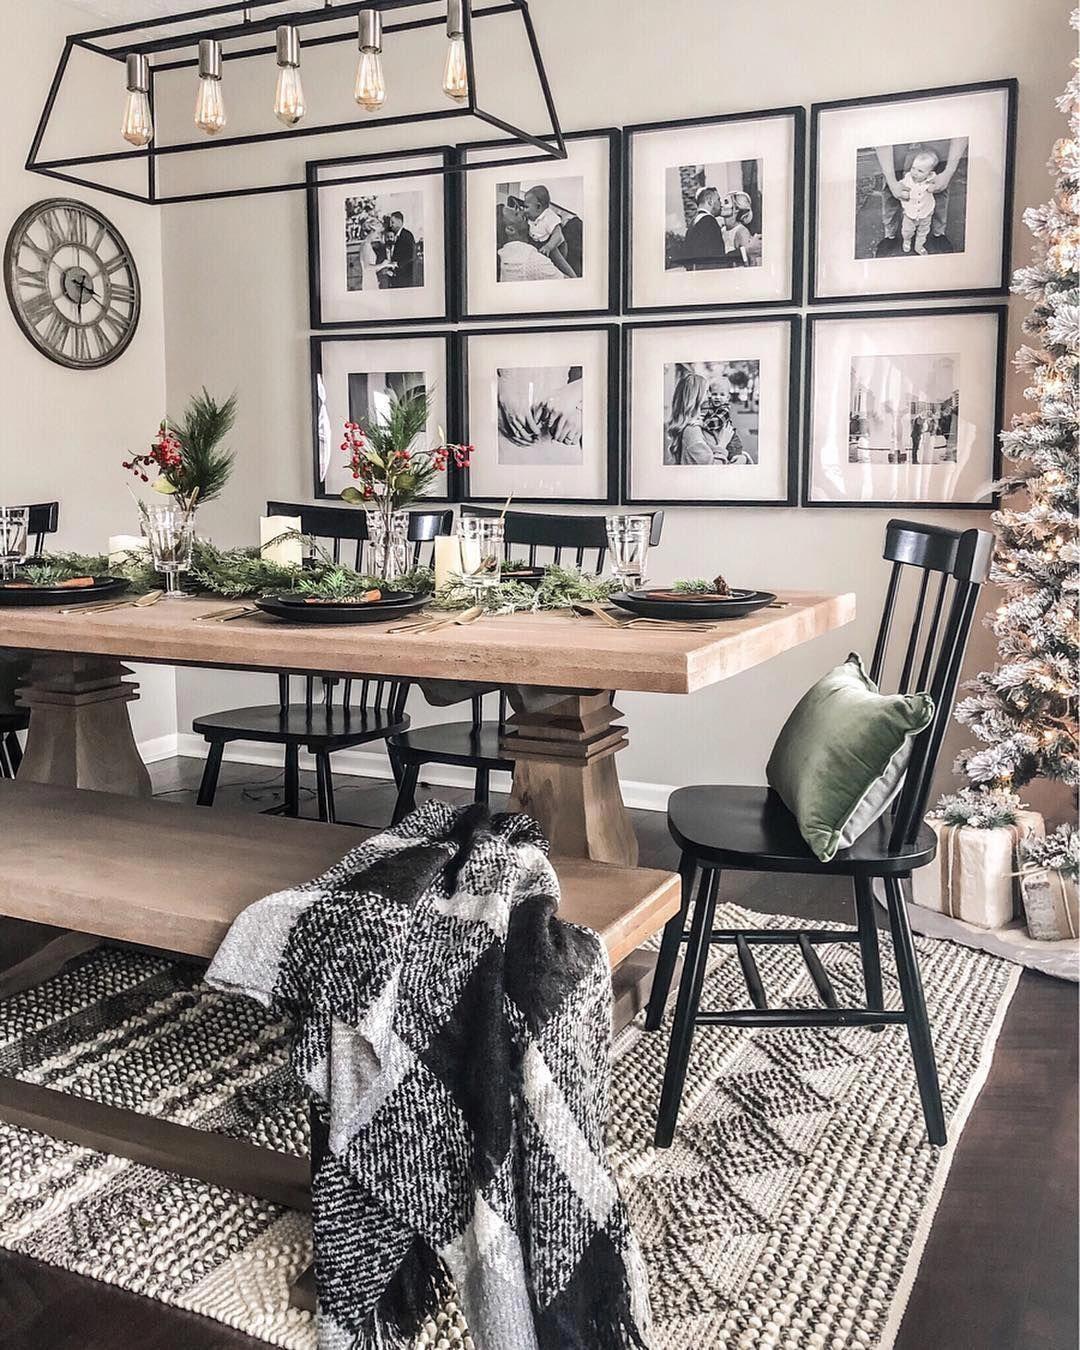 29 Best Dining Room Wall Decor Ideas 2018 Modern Contemporary In 2020 Dining Room Wall Decor Casual Dining Rooms Farm House Living Room